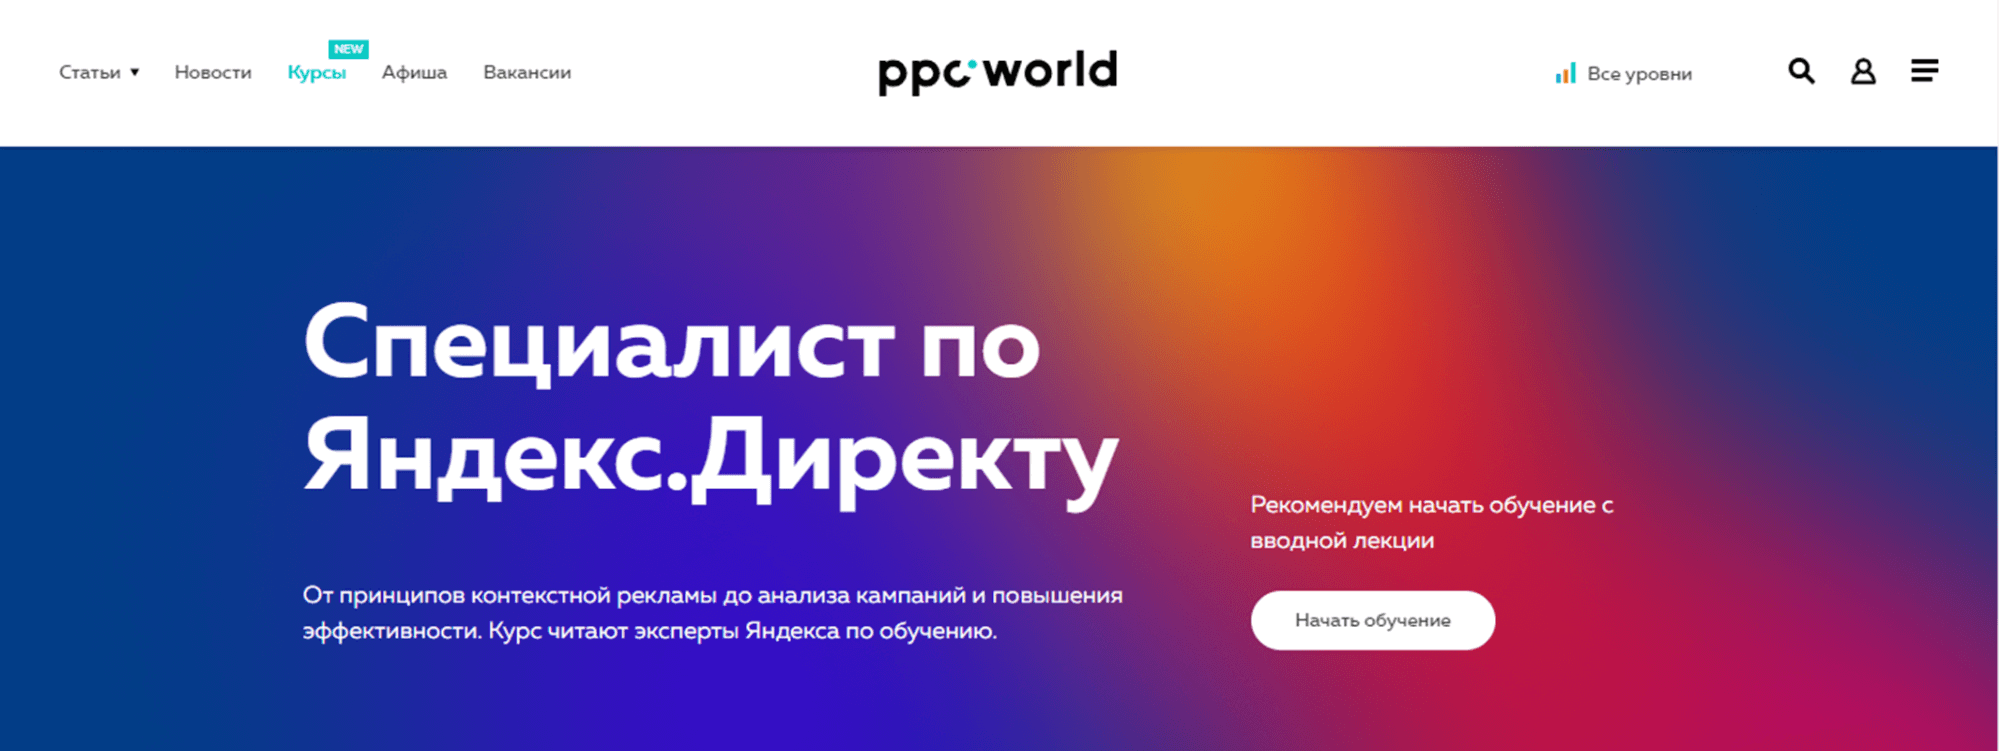 ppc.world